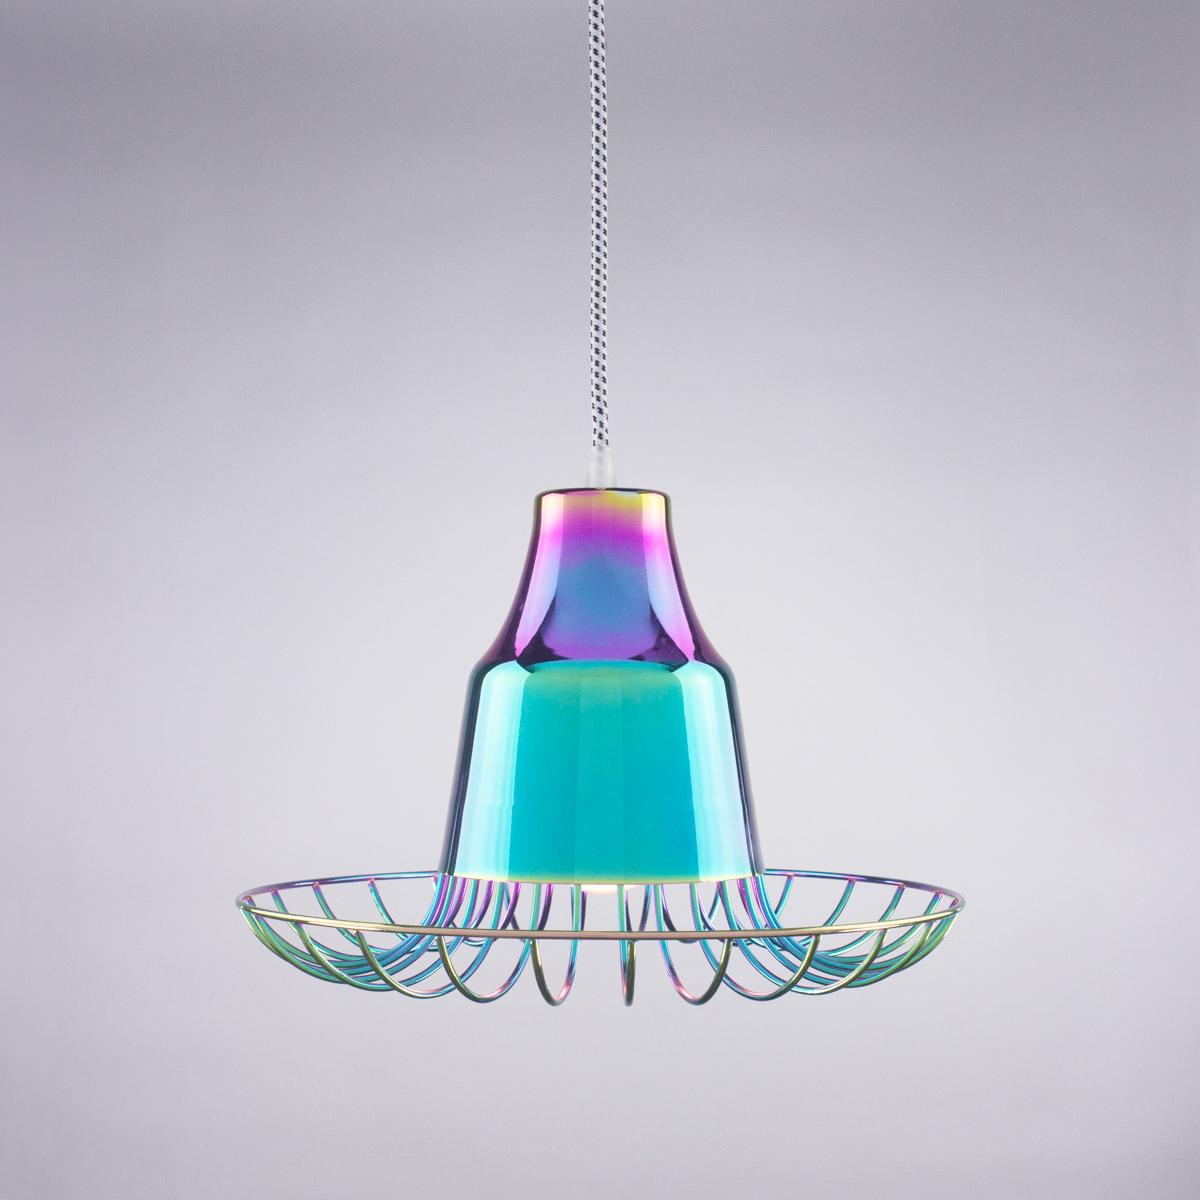 Customize Your Own Shelter Bay Lighting Design Milk